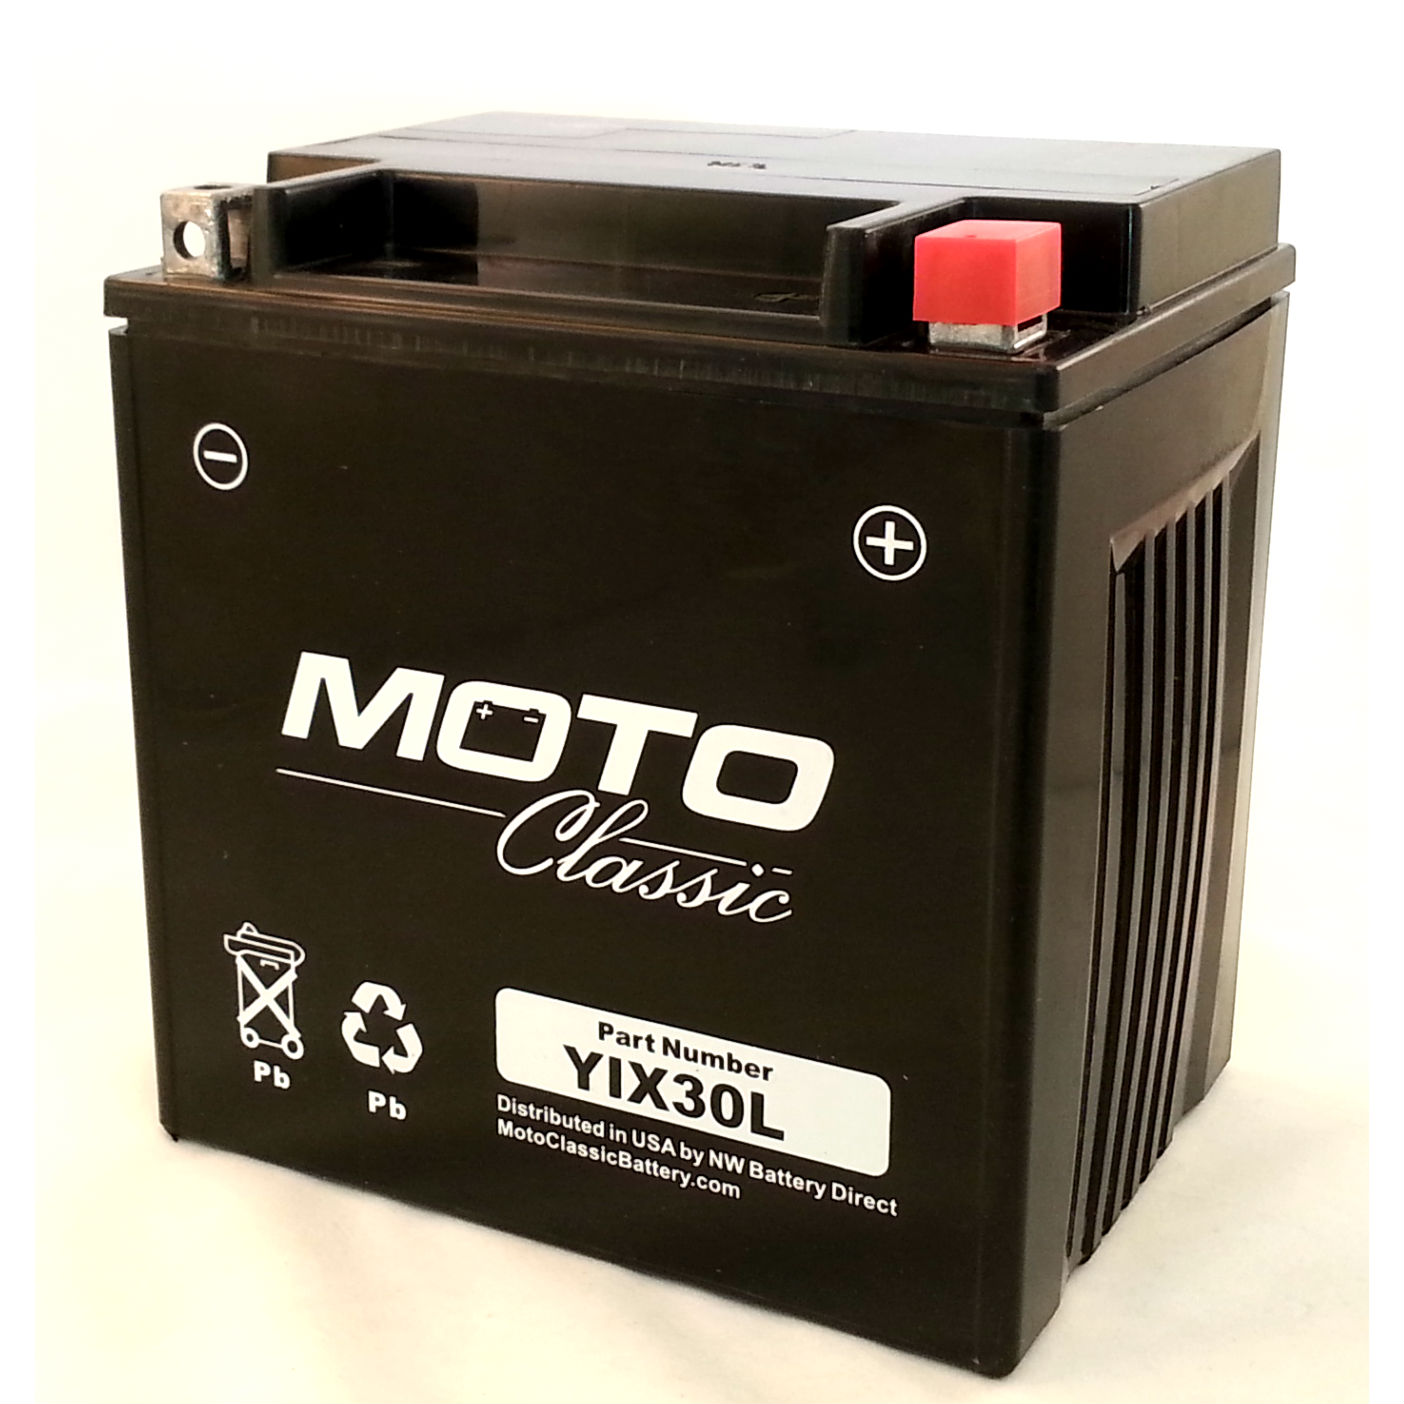 battery lookup magna power etx30l motorcycle battery. Black Bedroom Furniture Sets. Home Design Ideas